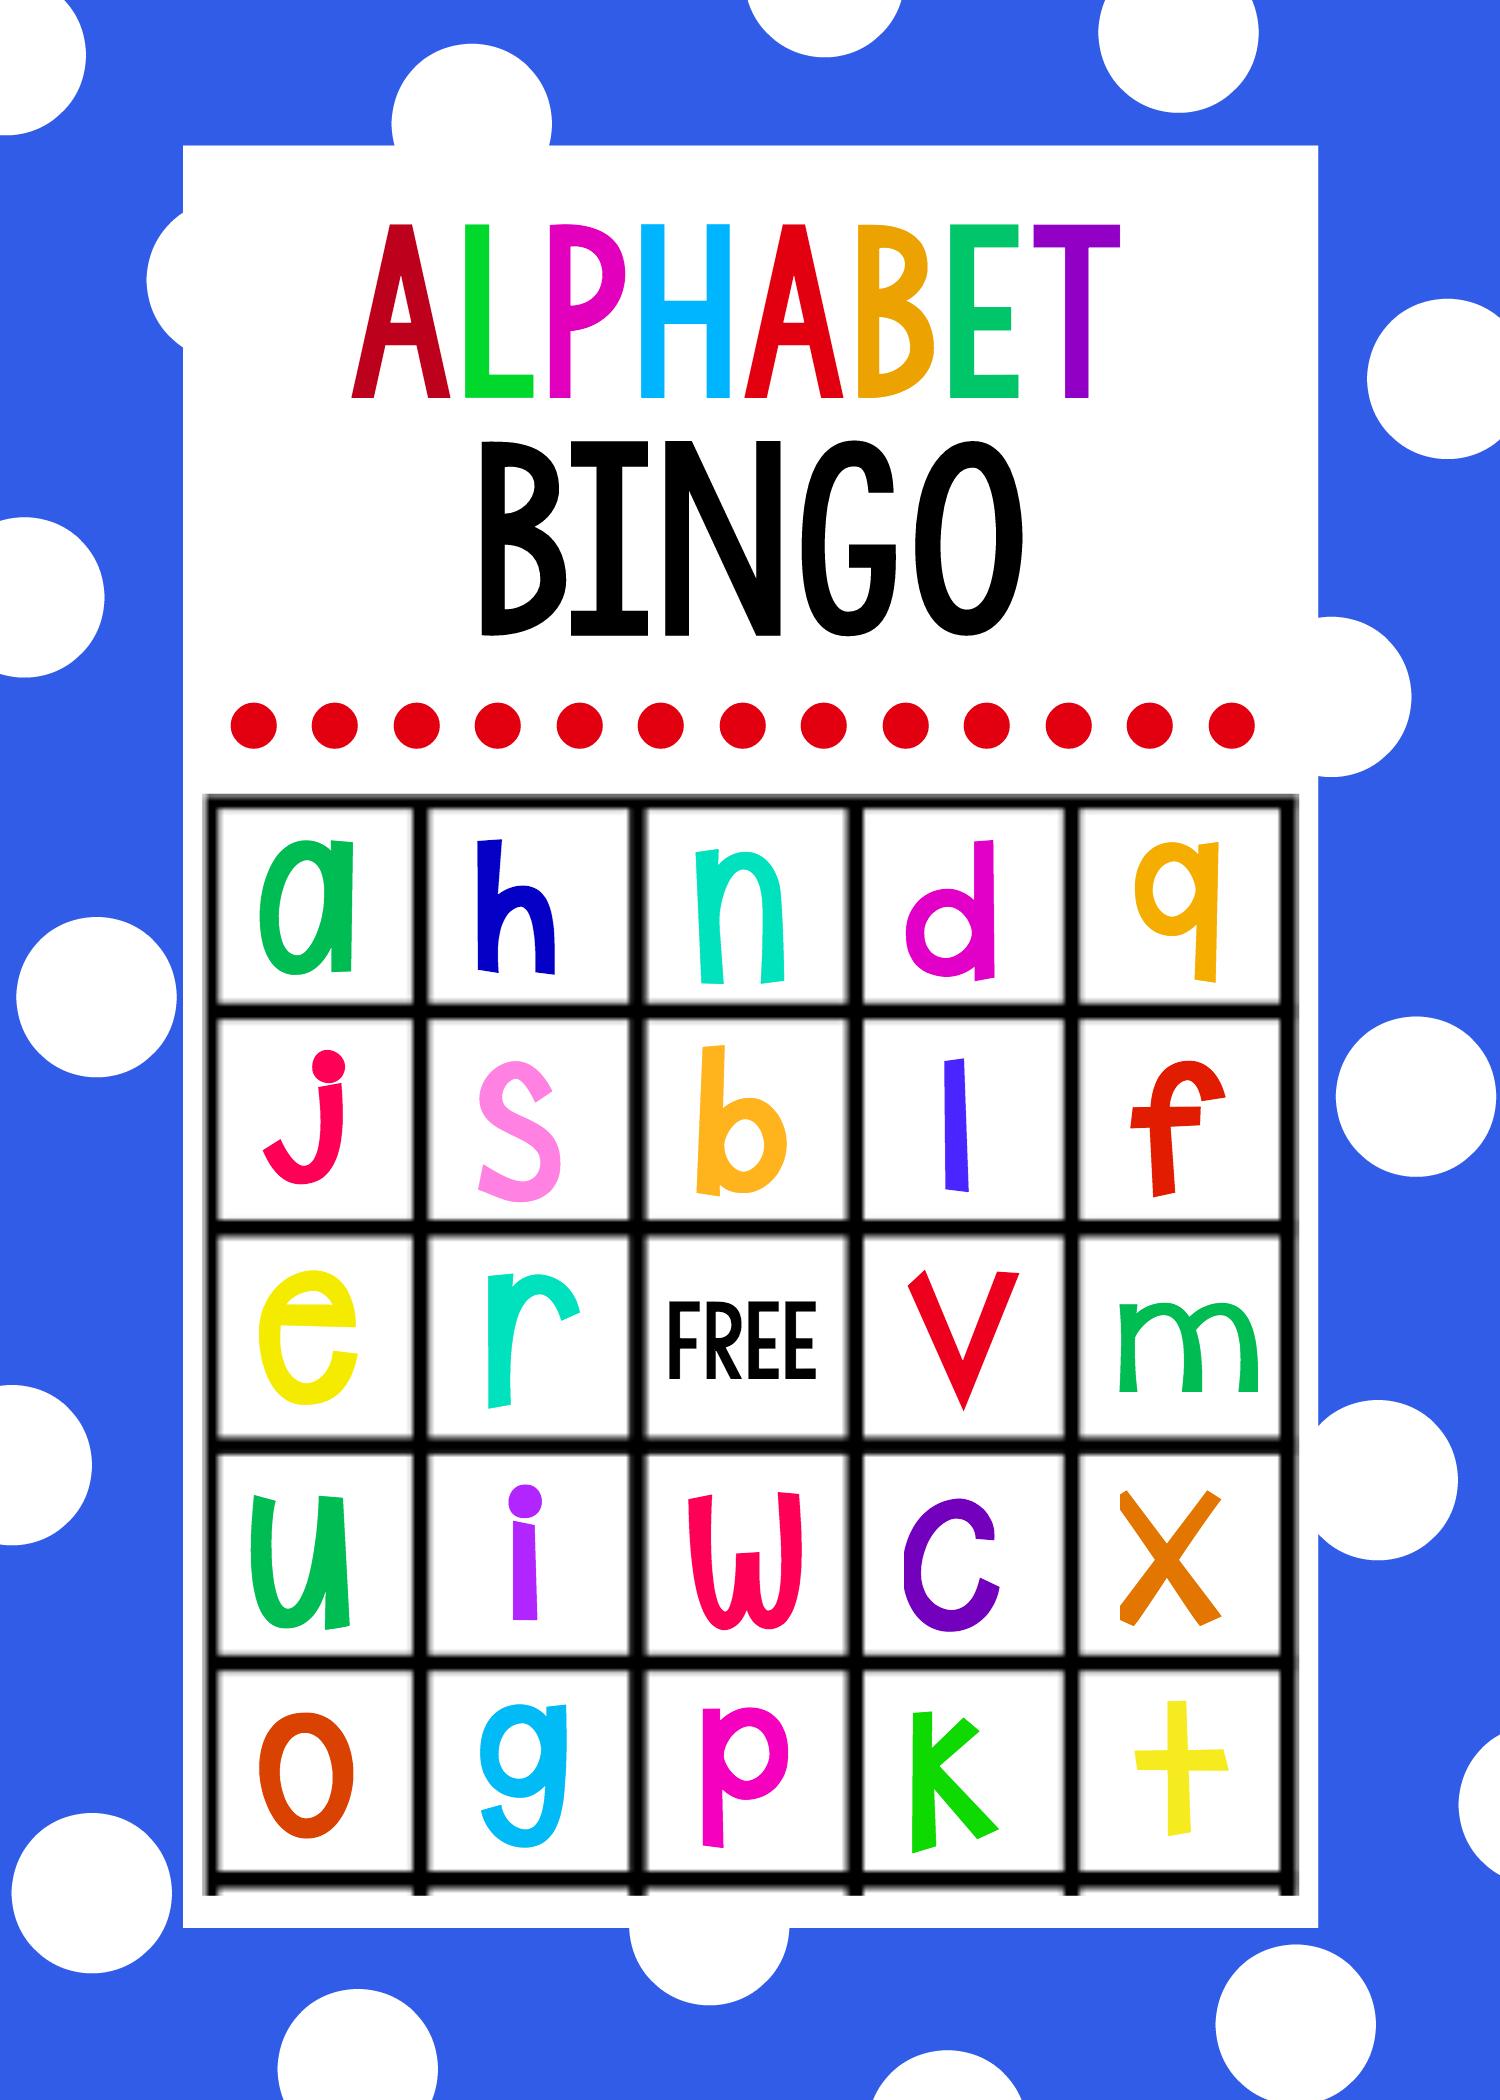 Lowercase Alphabet Bingo Game - Crazy Little Projects - Free Printable Alphabet Bingo Cards